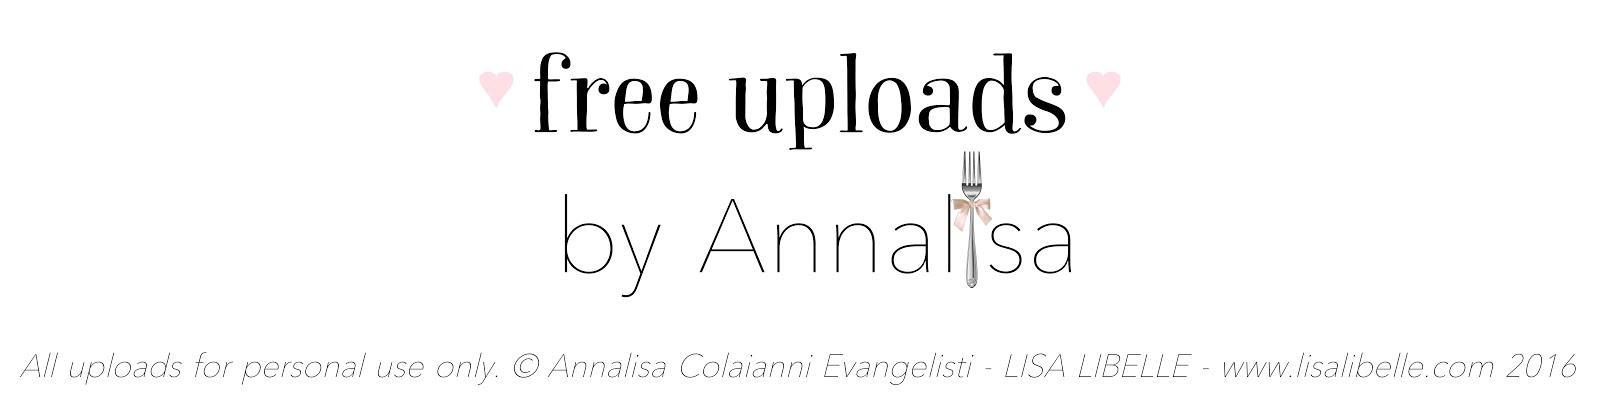 free uploads